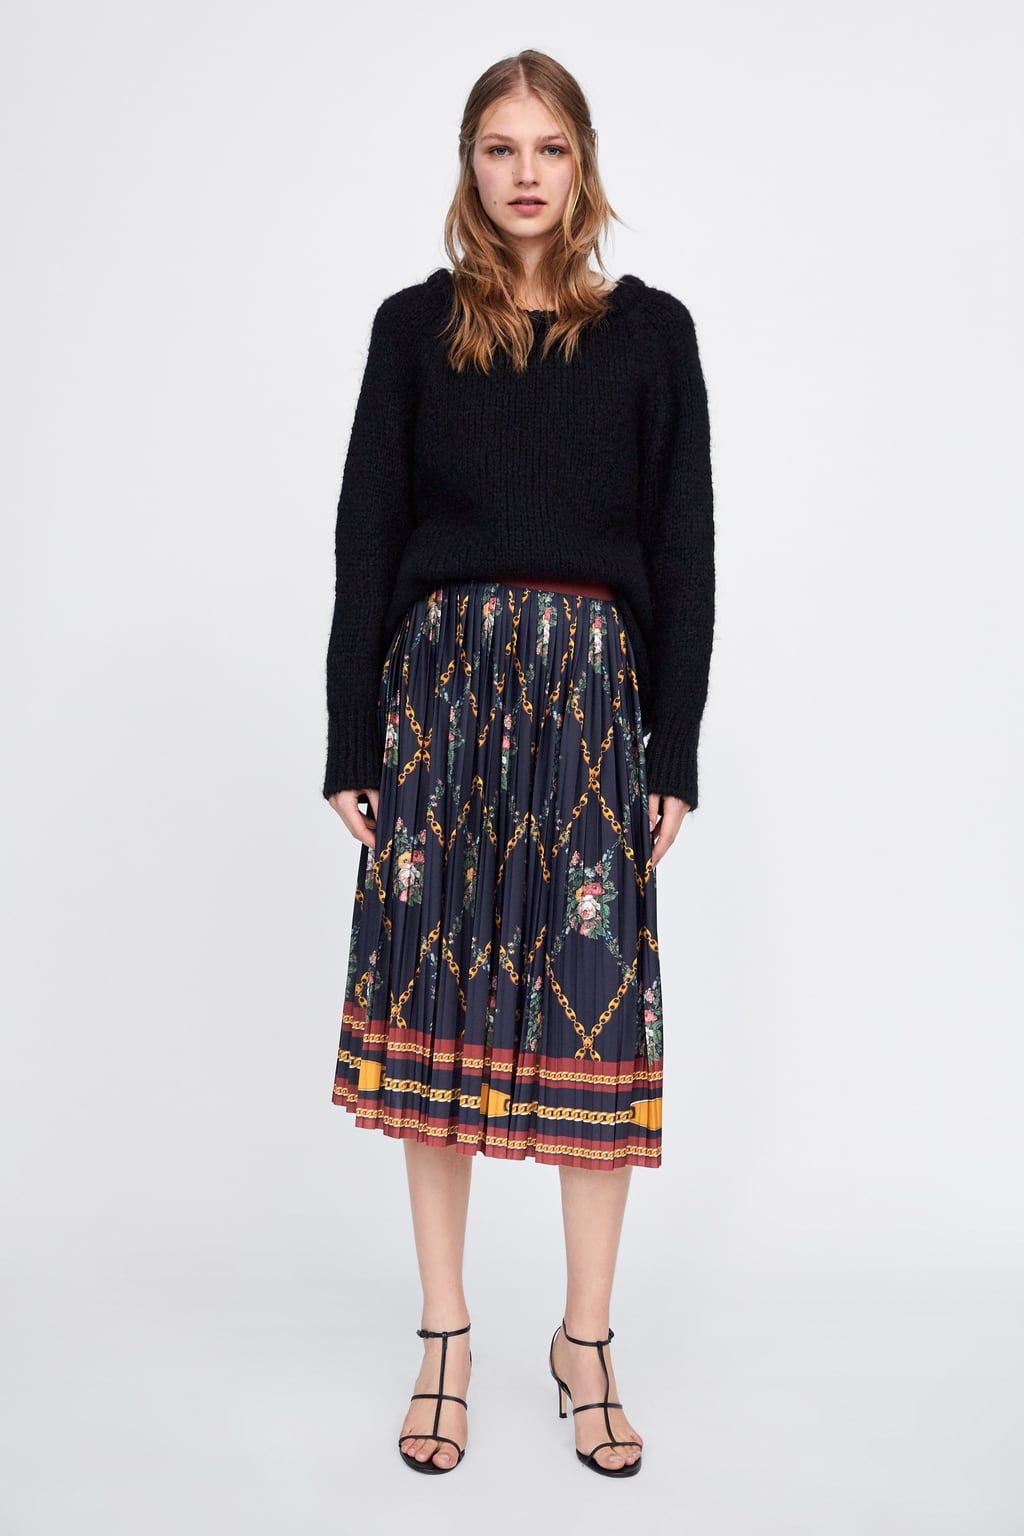 34af492e49 Chain print pleated skirt in 2019 | Wear2Shine Skirt | Pleated skirt ...